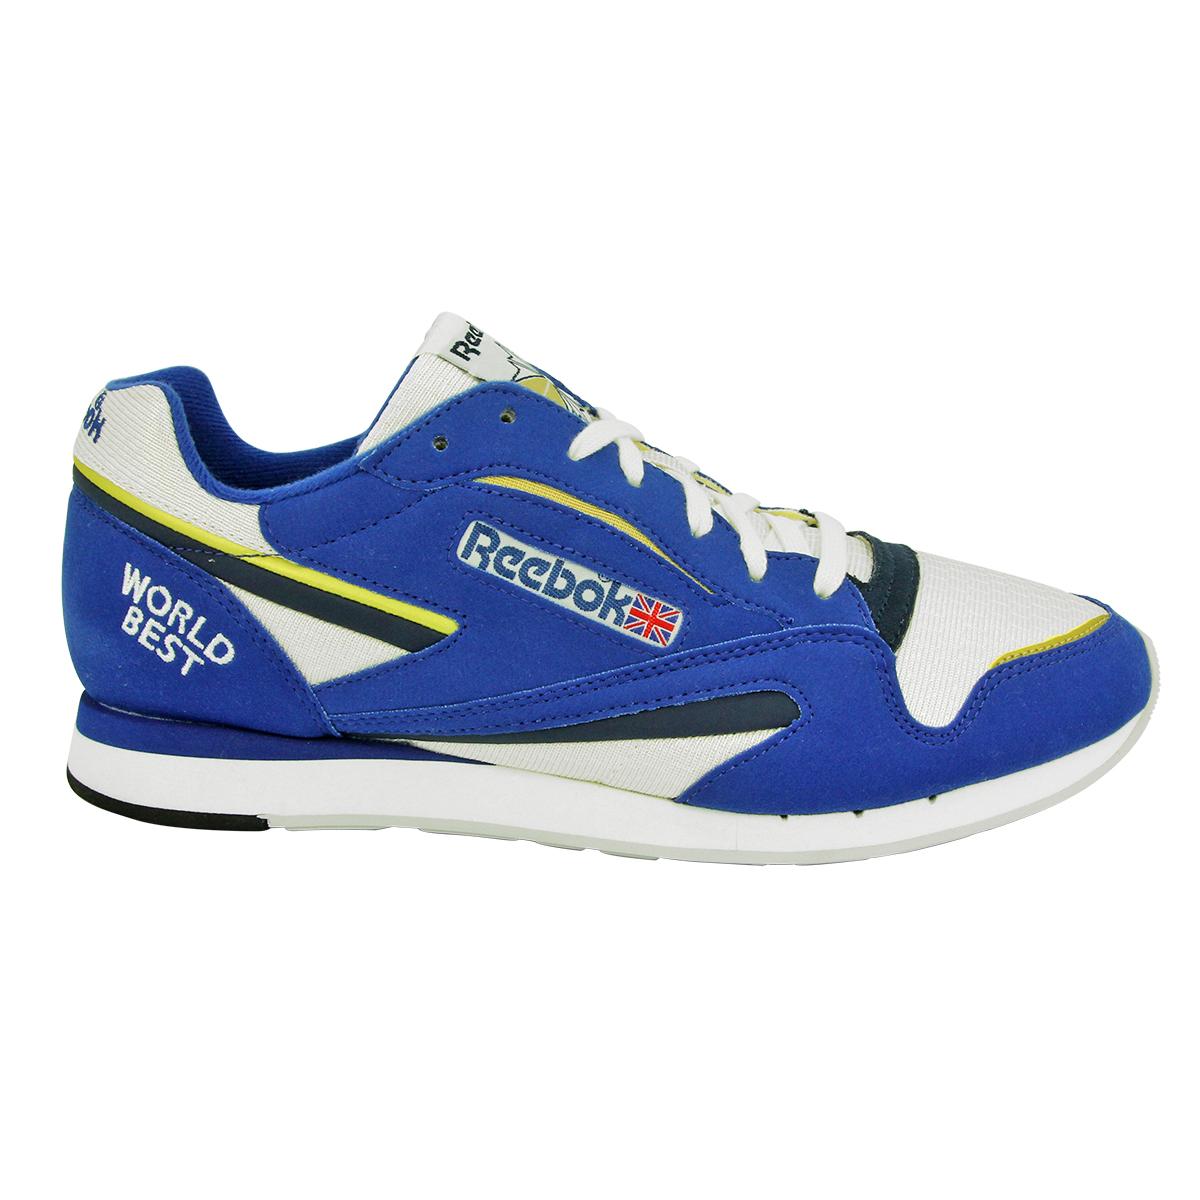 Reebok-WORLD-BEST-Chaussures-Mode-Sneakers-Homme-Cuir-Suede